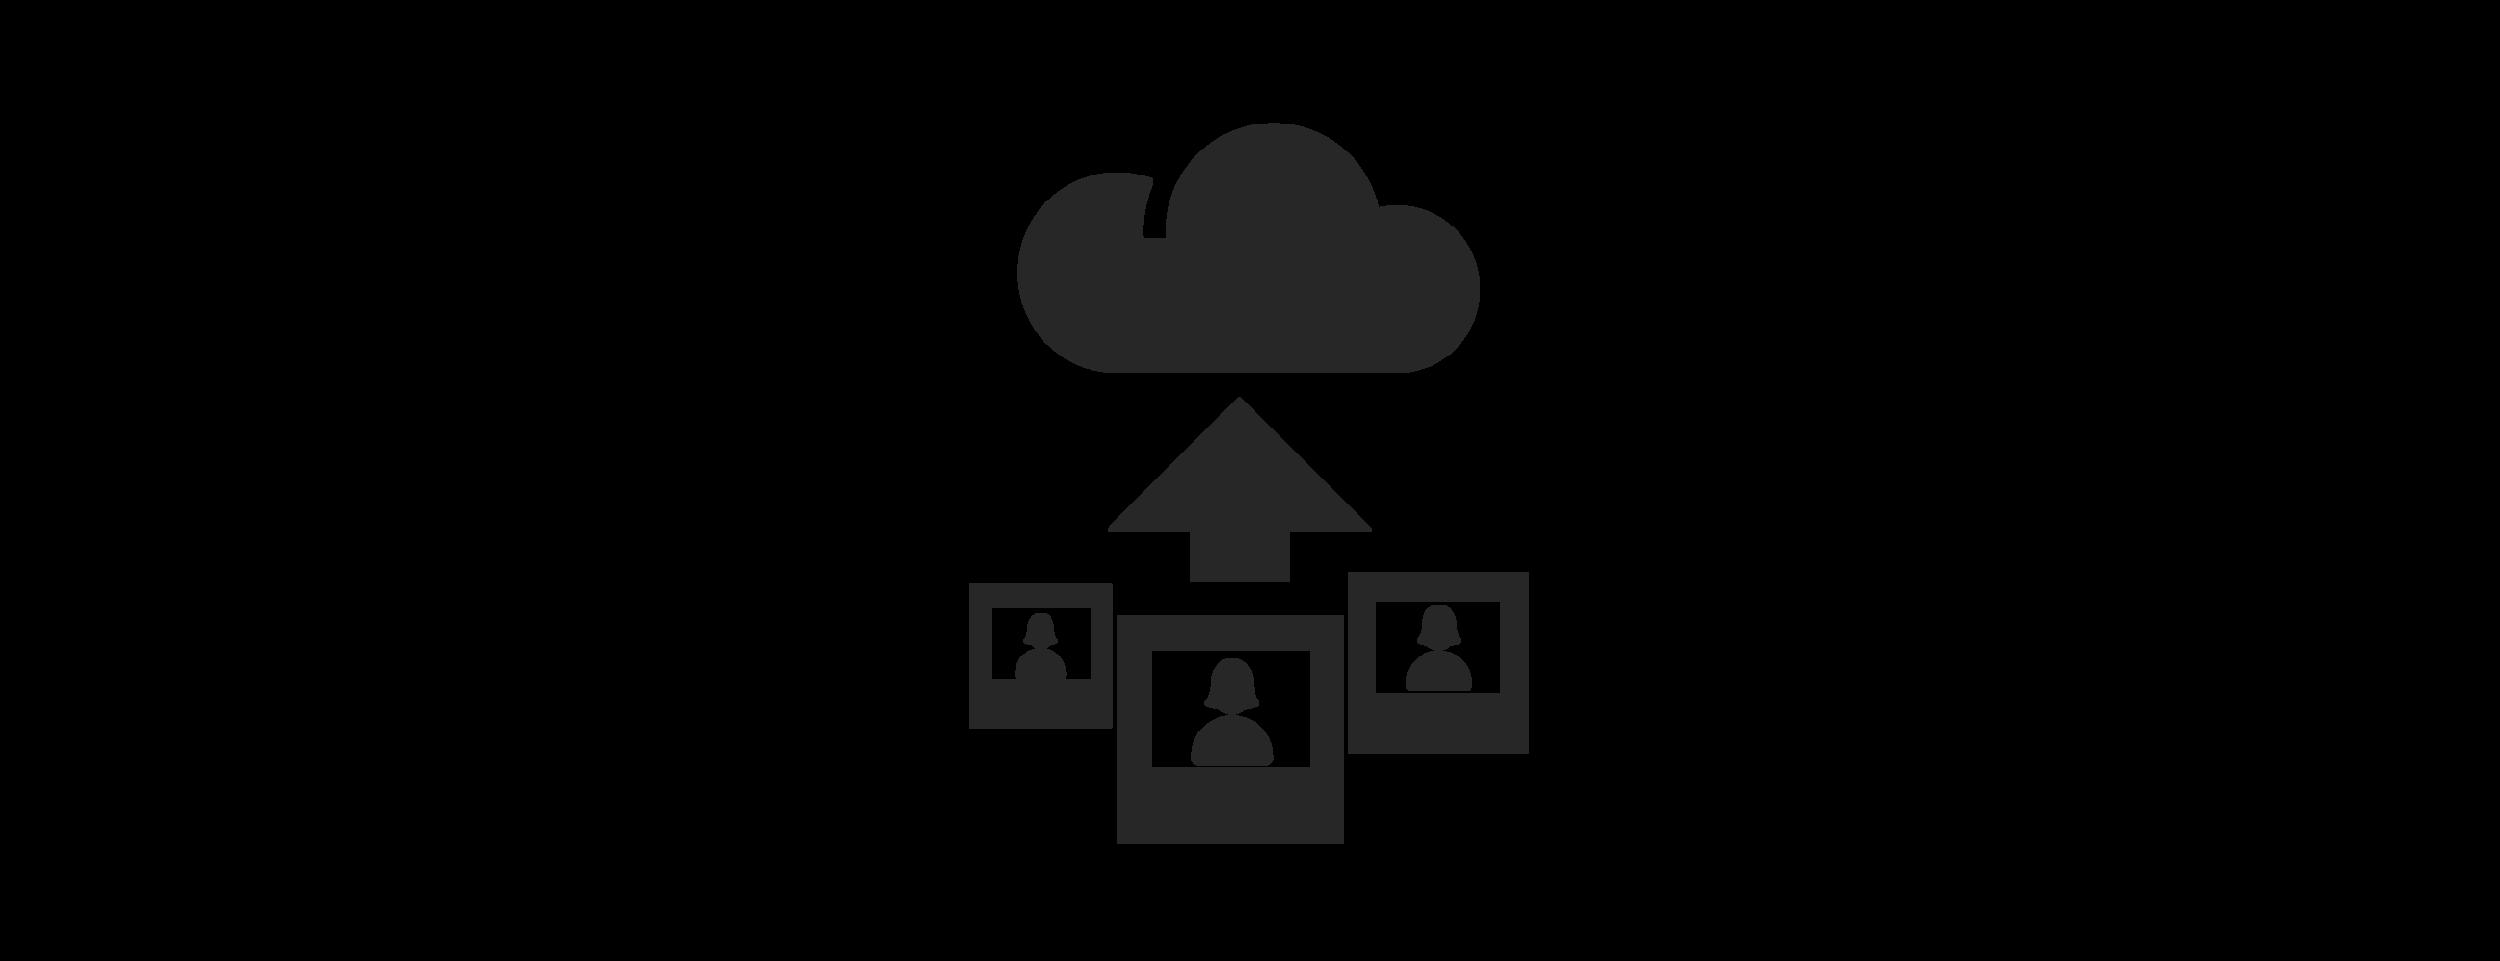 lieferung-fotos-cloud.png